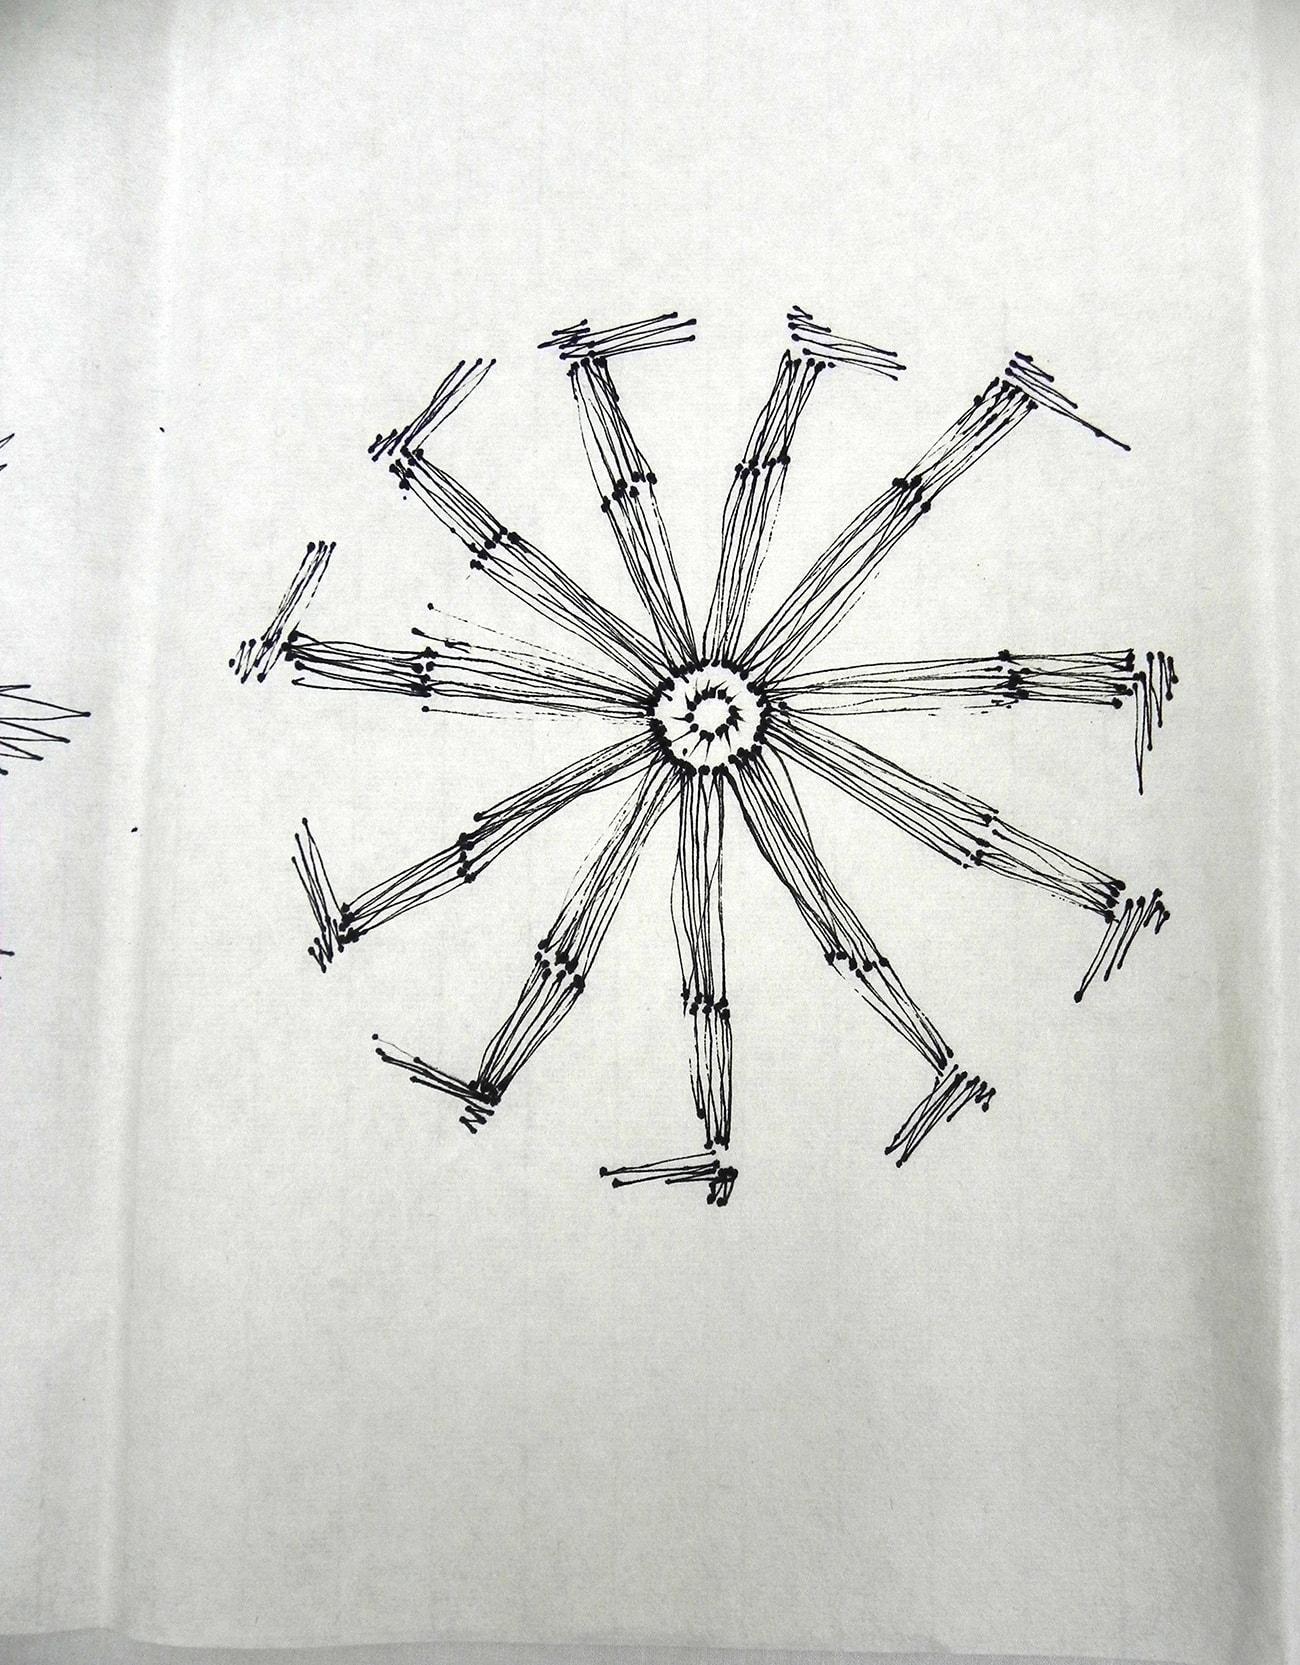 Consecutive Drawings 4D - Isabel Gómez Liebre